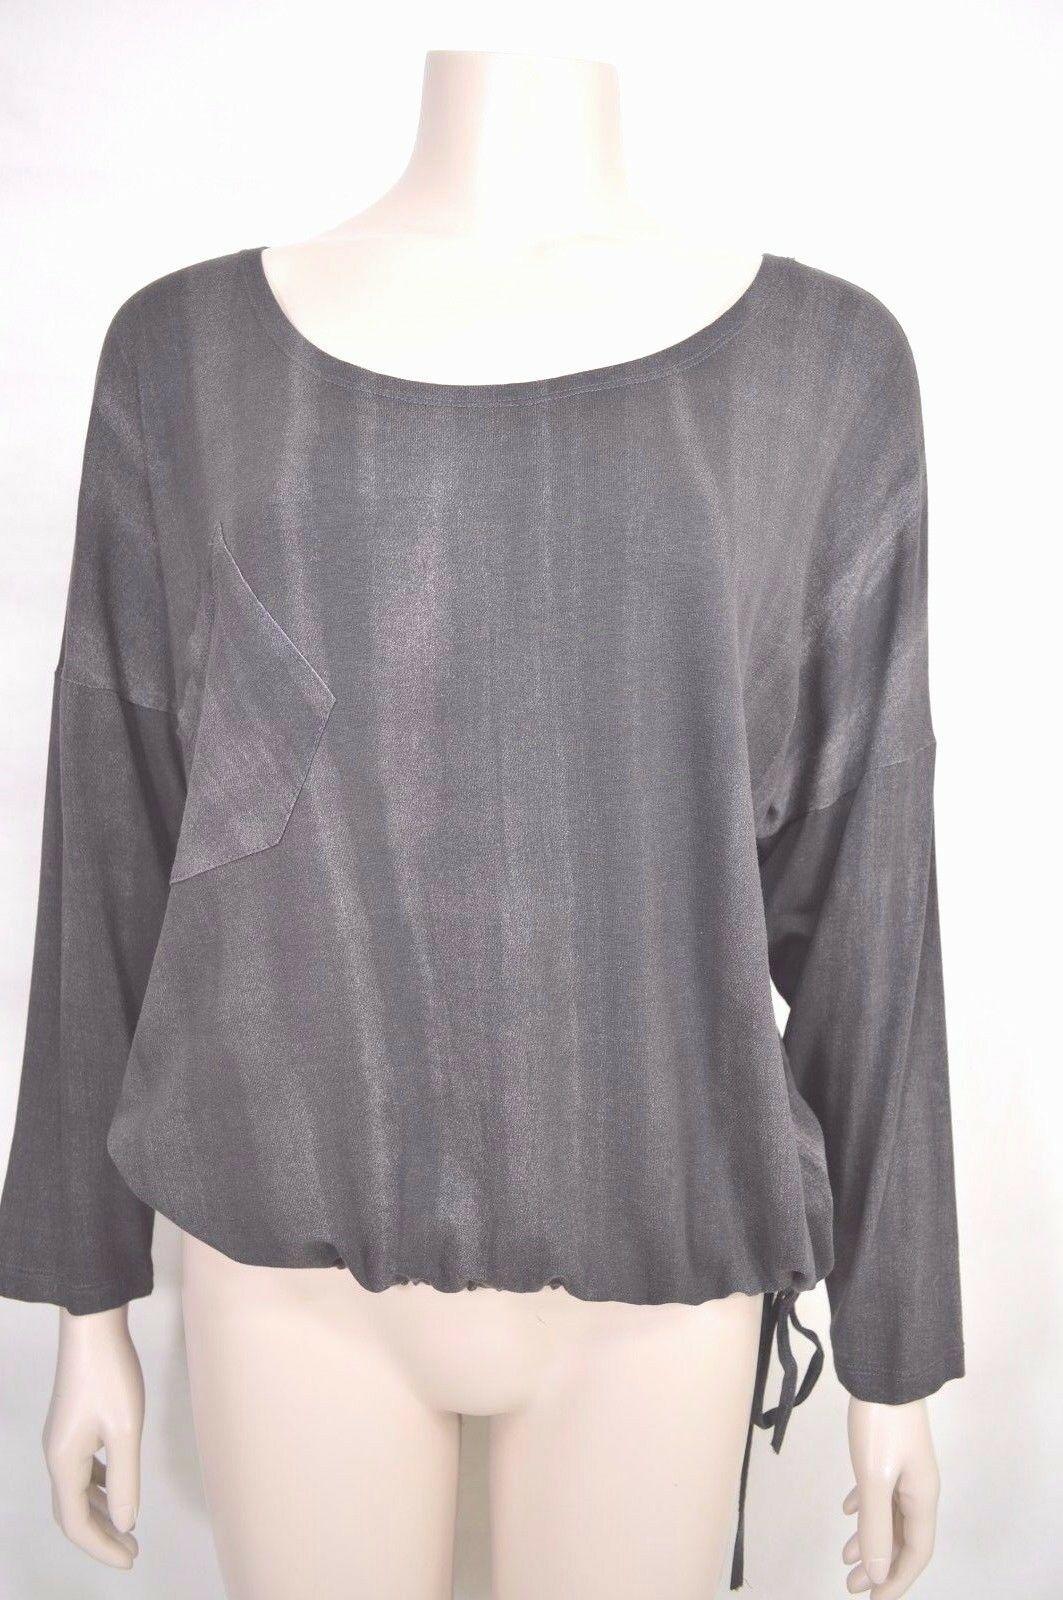 Matti Mamane top SZ M NWT dark gray drawstring waist scoop neck 3/4 sleeve new image 2